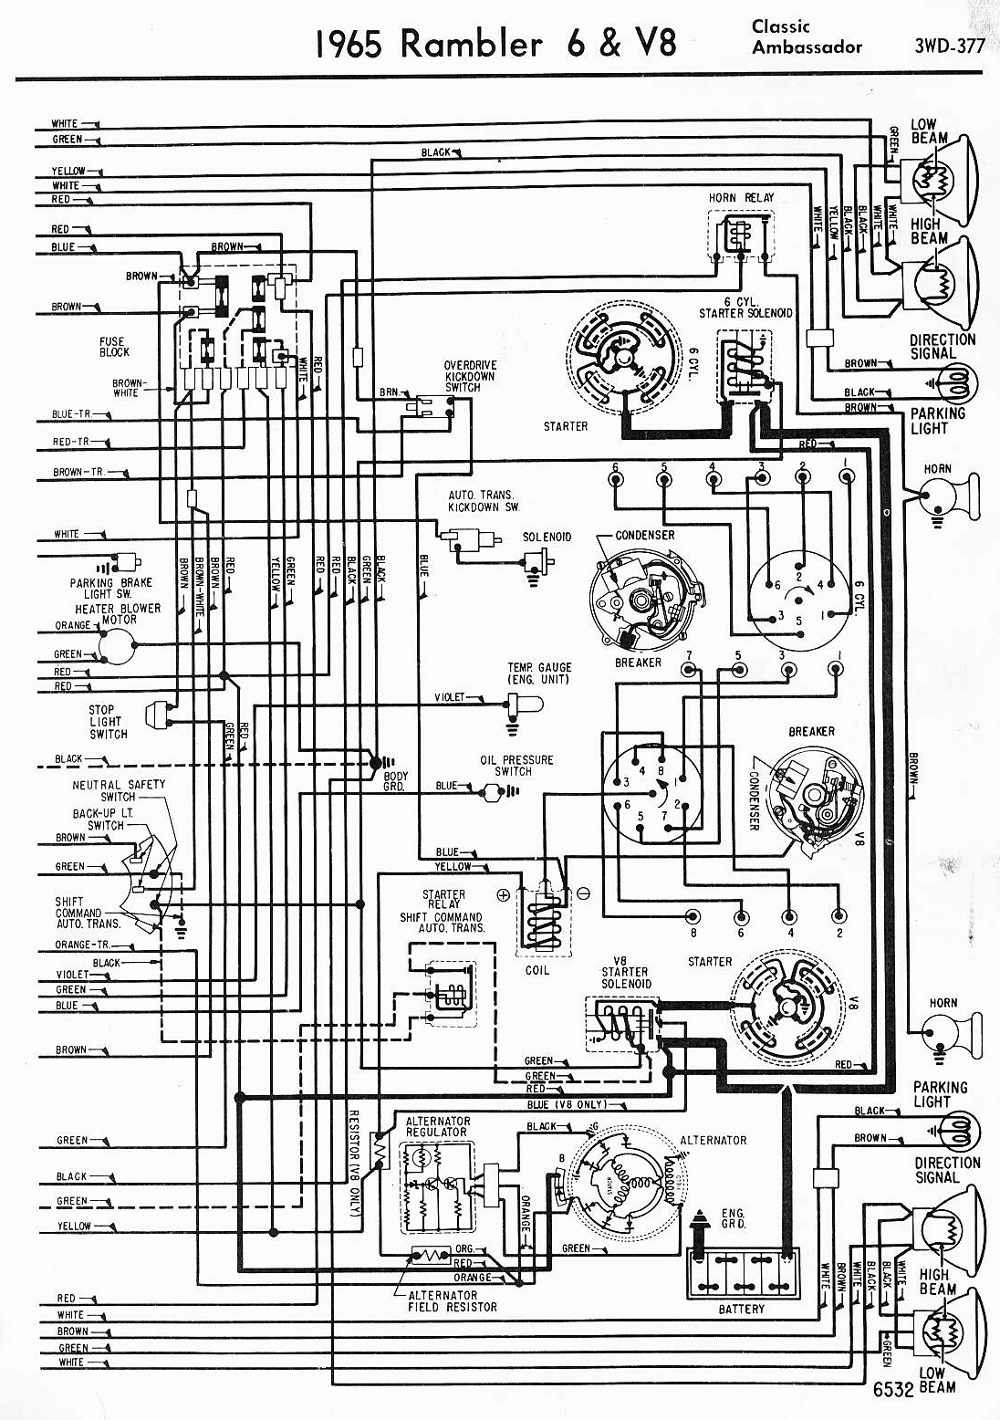 amc car manuals wiring diagrams pdf fault codes rh automotive manuals net 1967 AMC Rebel Machine 1968 AMC Rebel 770